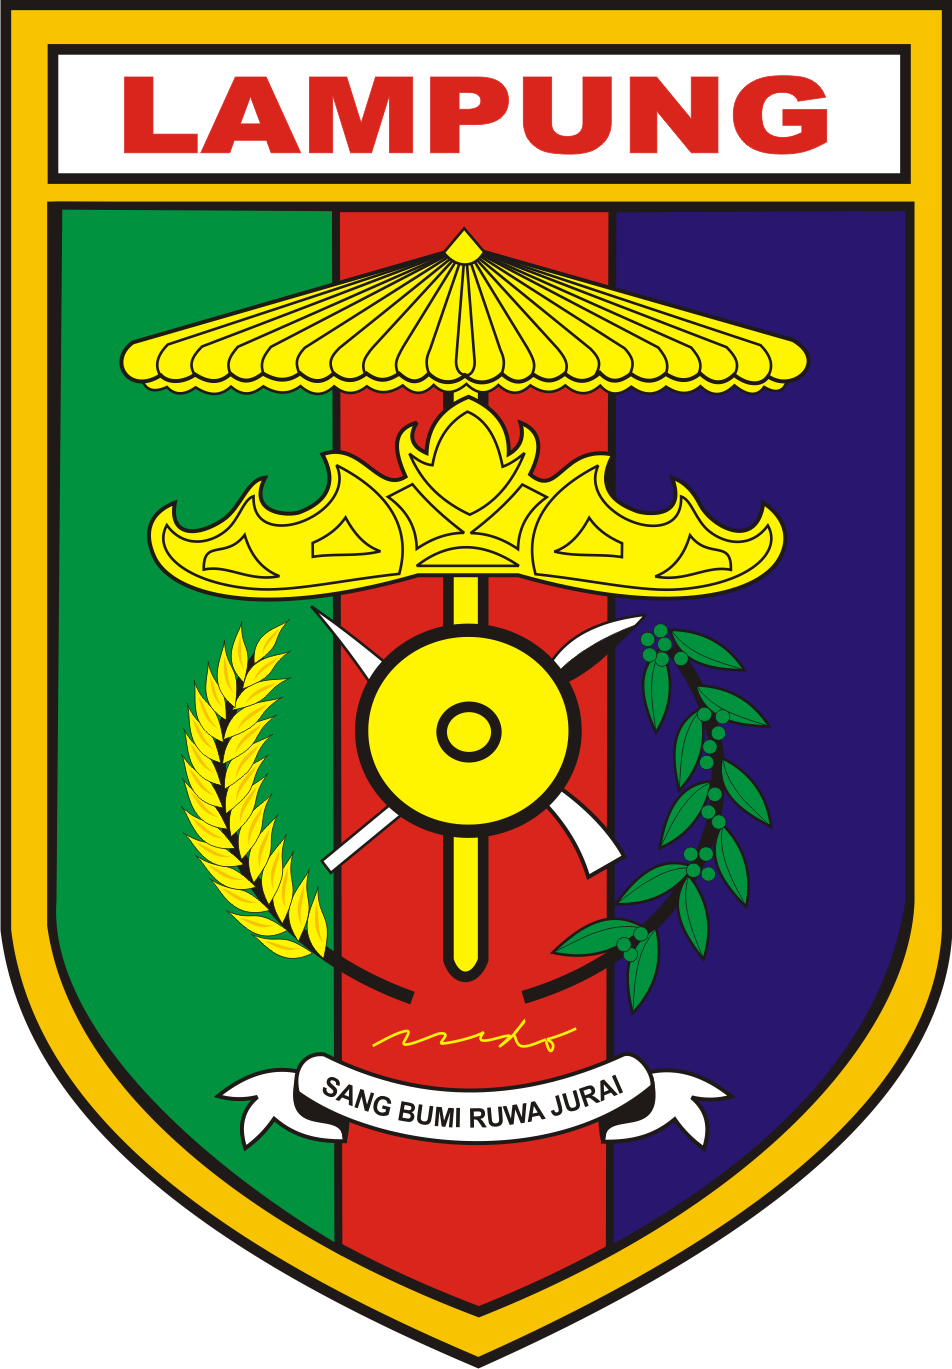 Pengumuman Kelulusan Hasil Seleksi CPNS Pemprov Lampung 2014